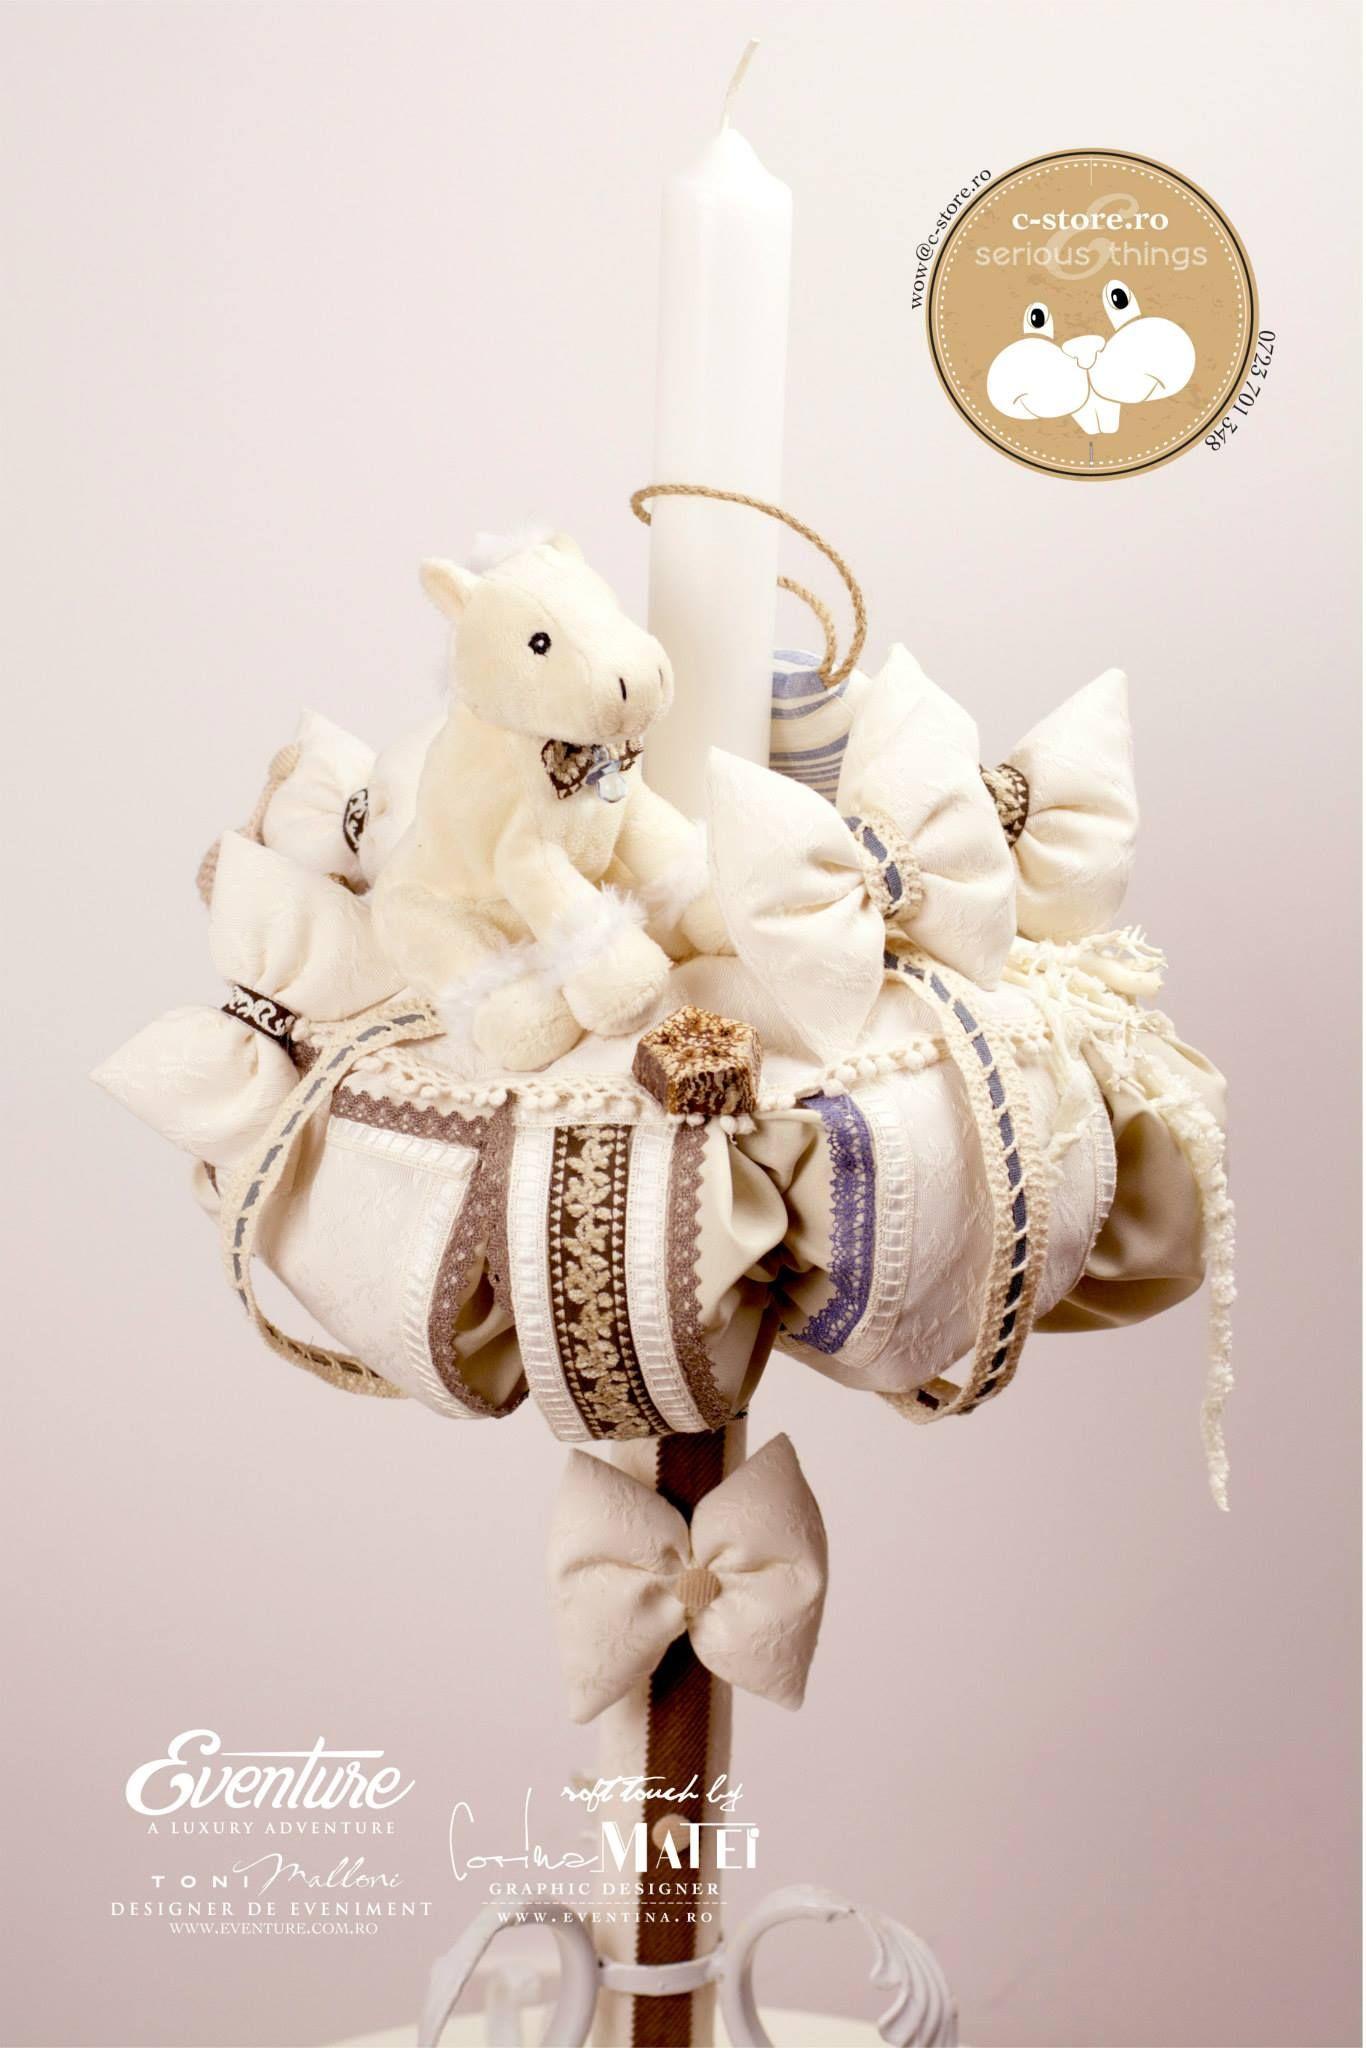 buy popular 6d7cd 30043 LUMANARE DE BOTEZ BY TONI MALLONI   SHOP ONLINE WWW.C-STORE ...